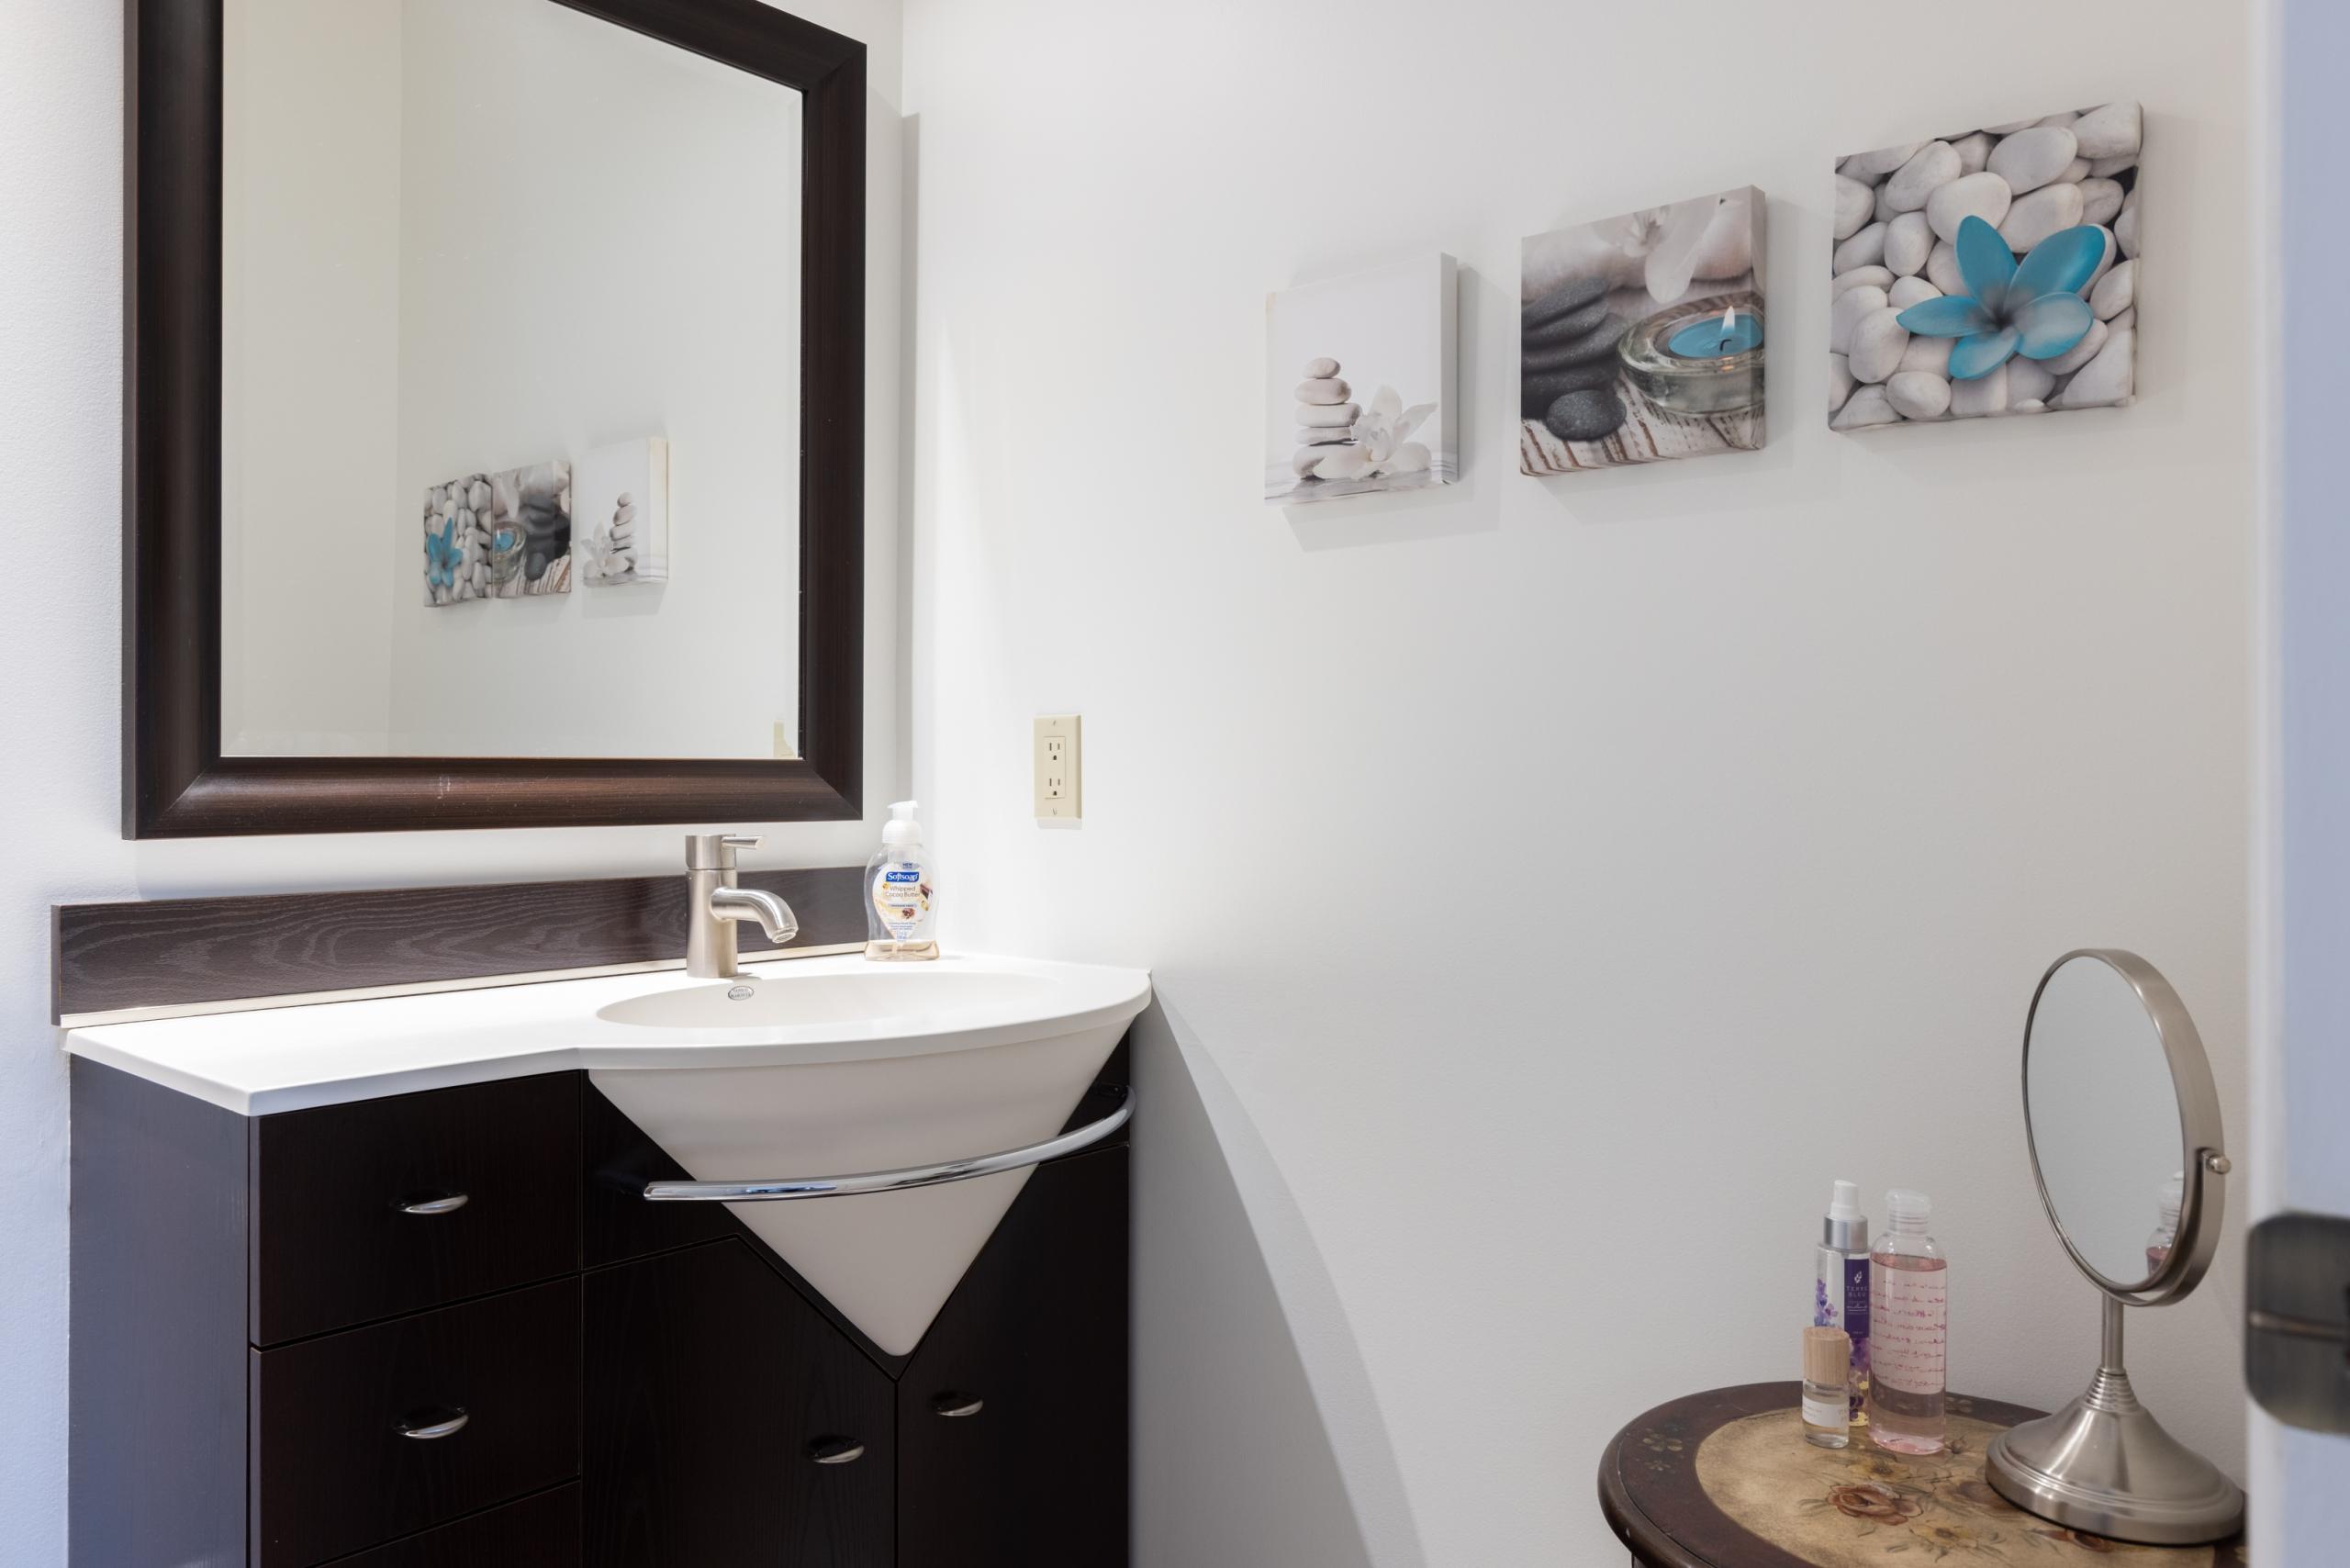 Bathroom featured at 16-2299 Marine Drive, Oakville, ON at Alex Irish & Associates